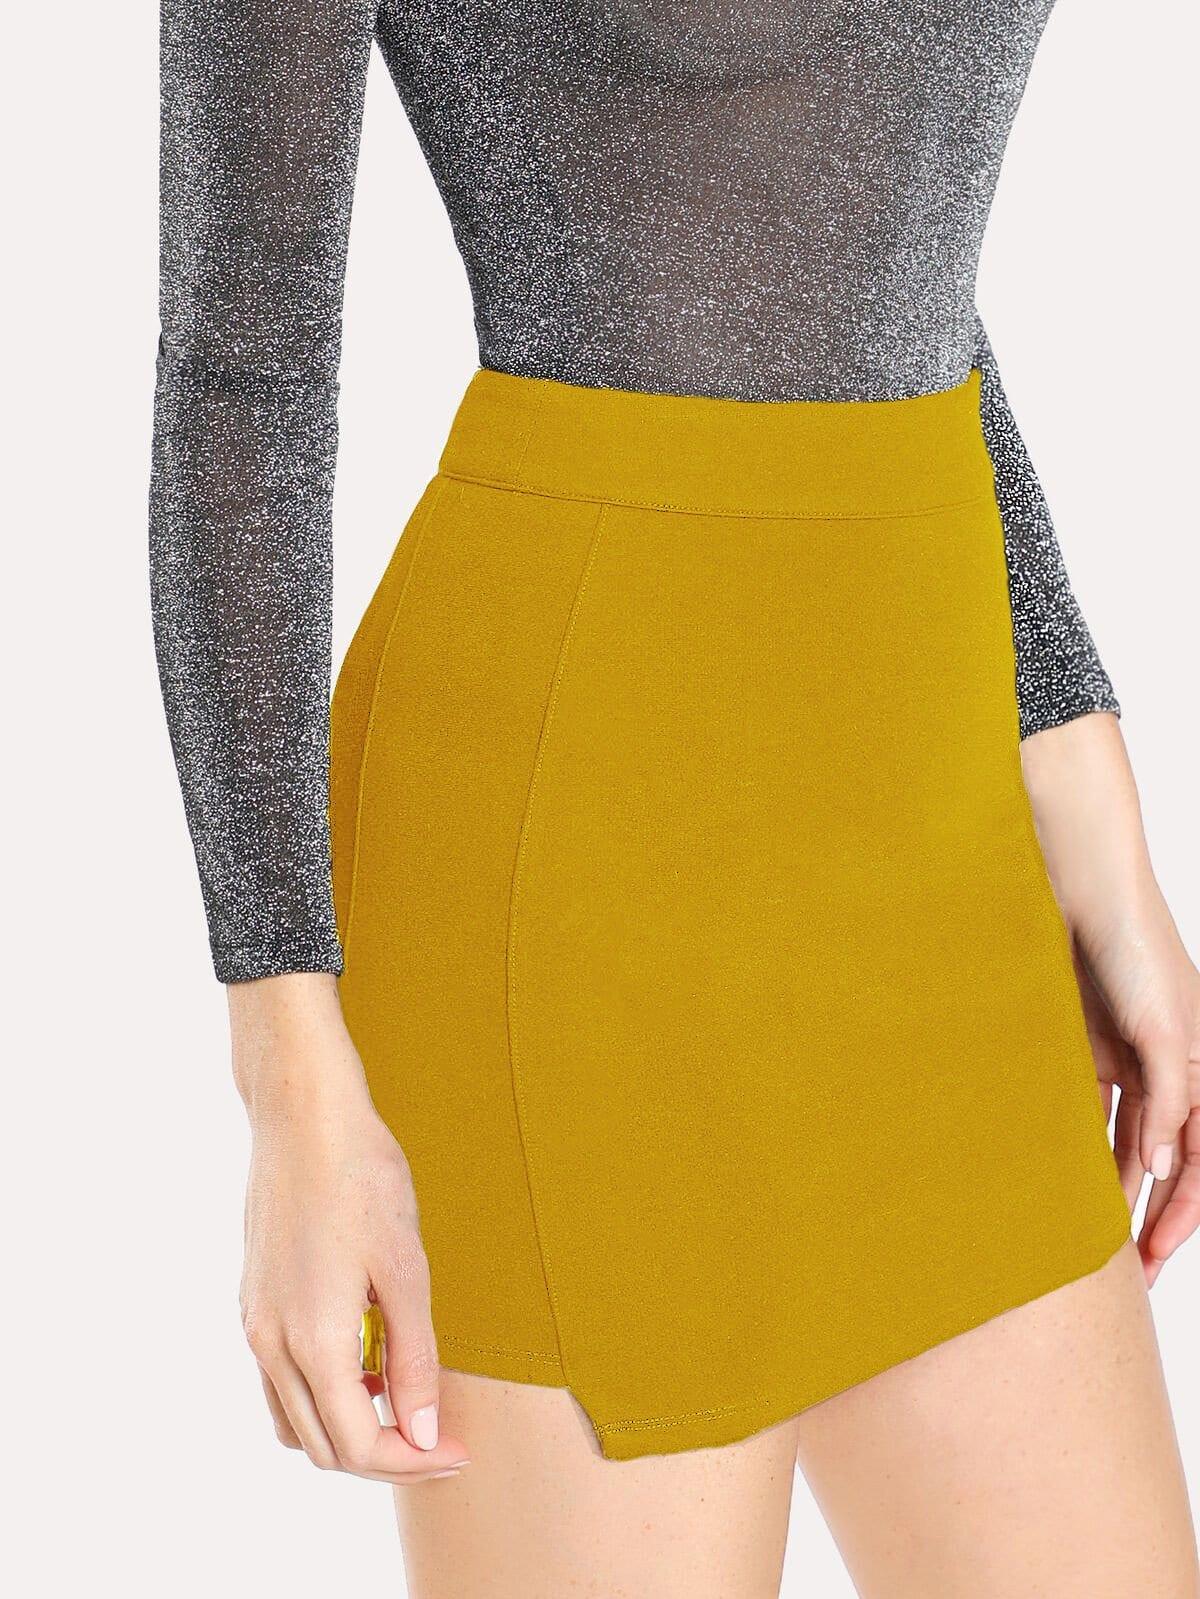 Solid Knit Bodycon Skirt кожаная куртка quelle ashley brooke by heine 14394